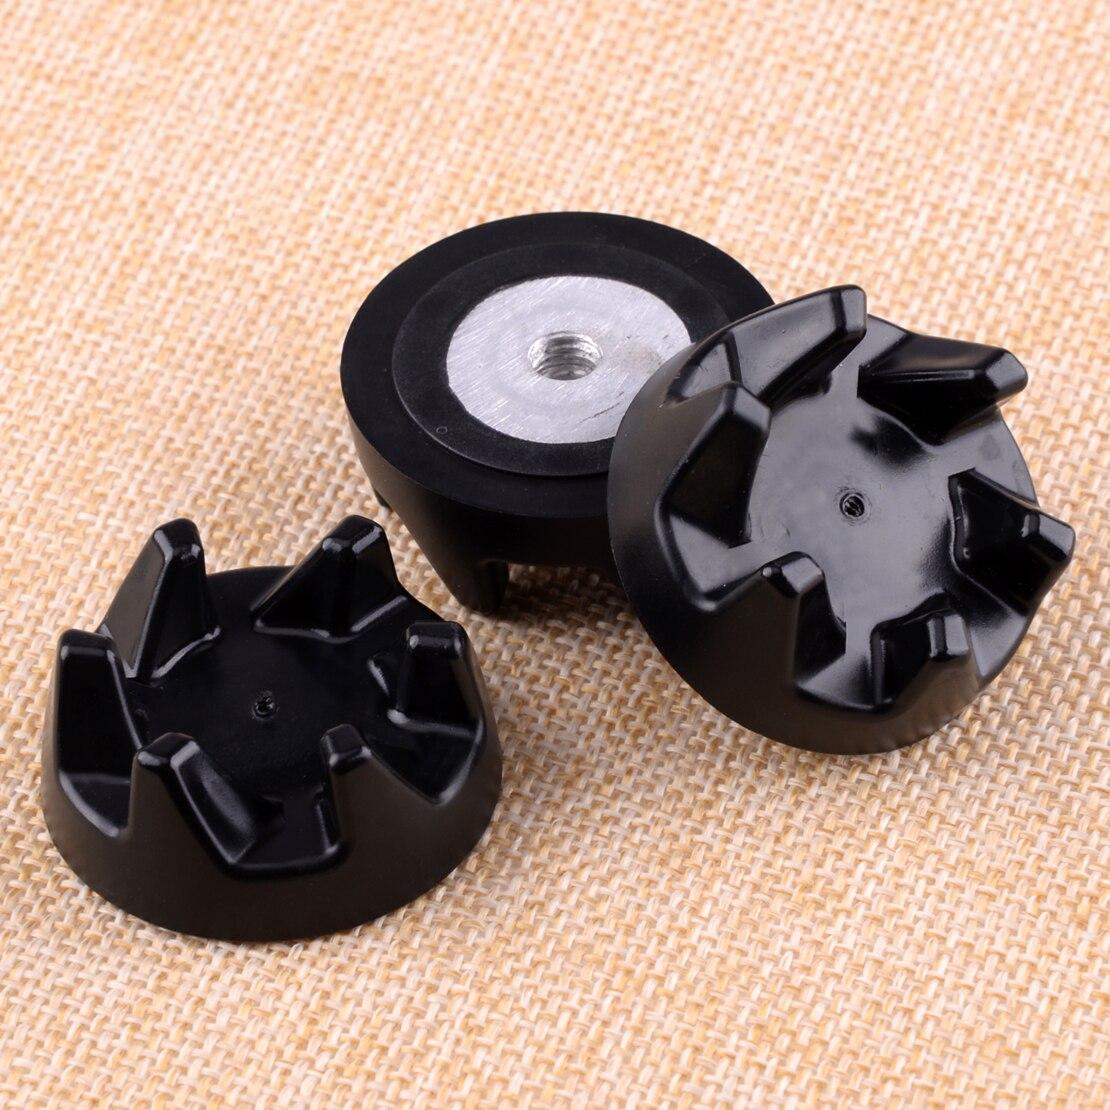 LETAOSK 3pcs Replacement Rubber Clutch Coupler Coupling Cog Shear Gear Mixer Parts Fit For Kitchenaid Blender 9704230